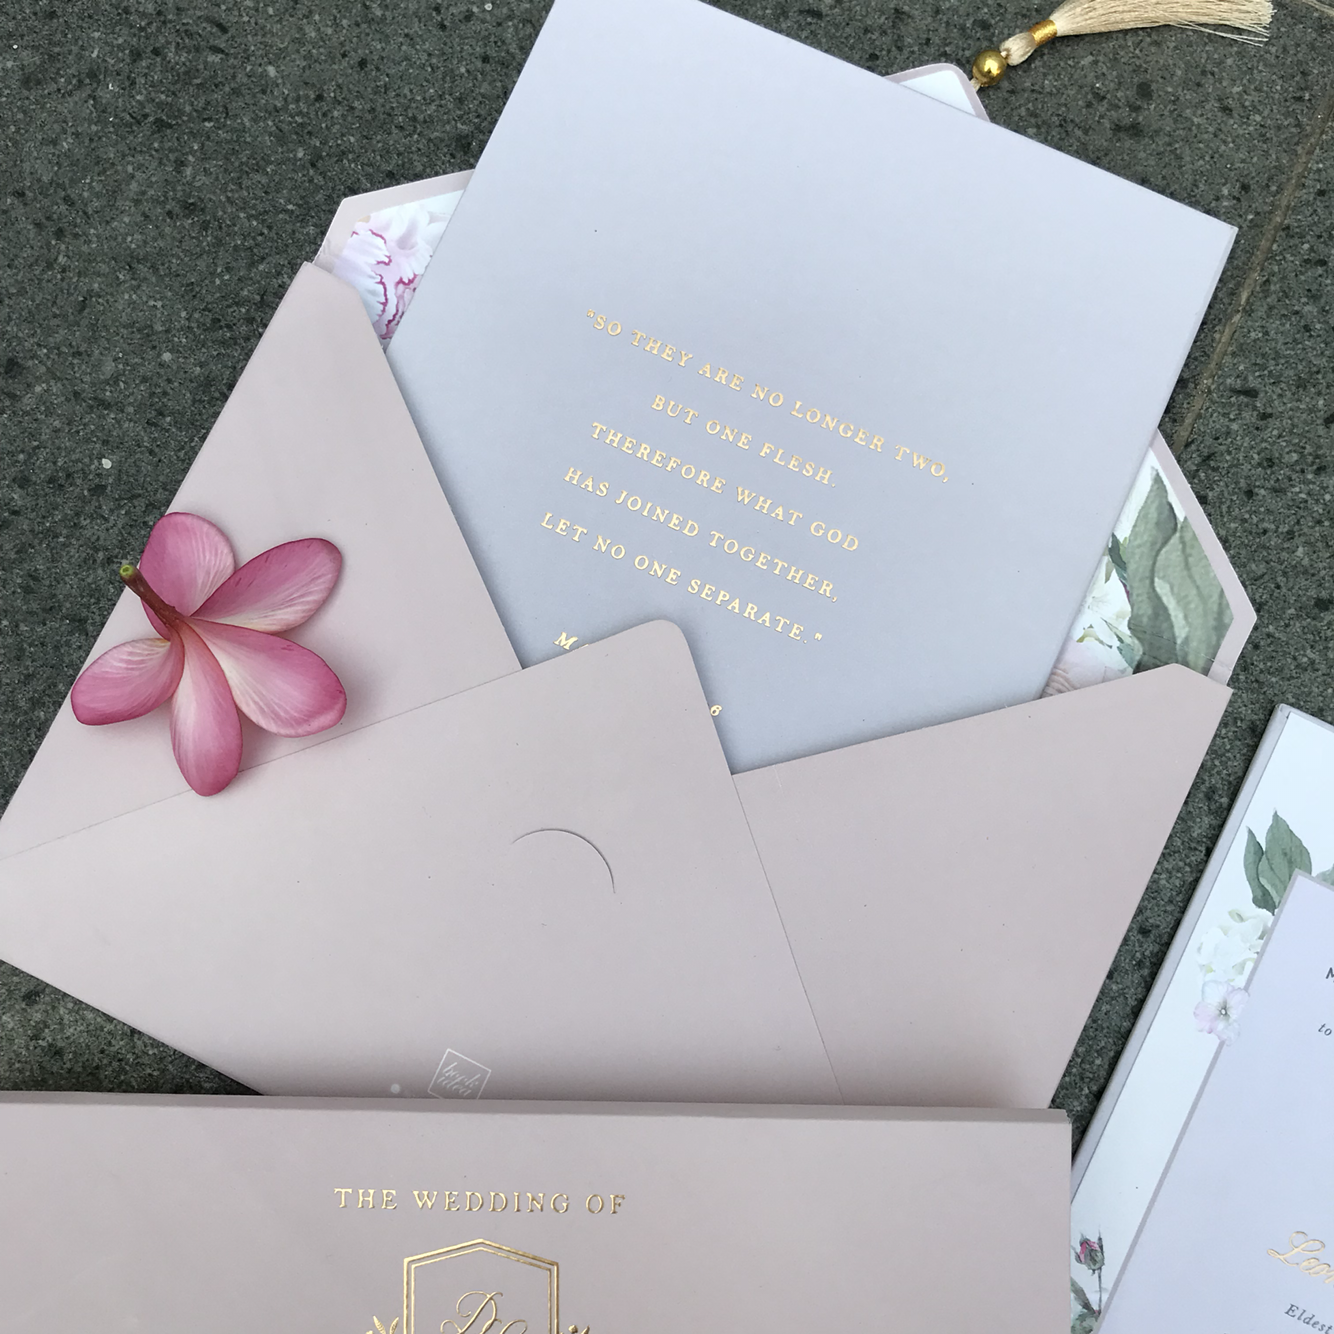 Bookea wedding favors gifts in jakarta bridestory izmirmasajfo